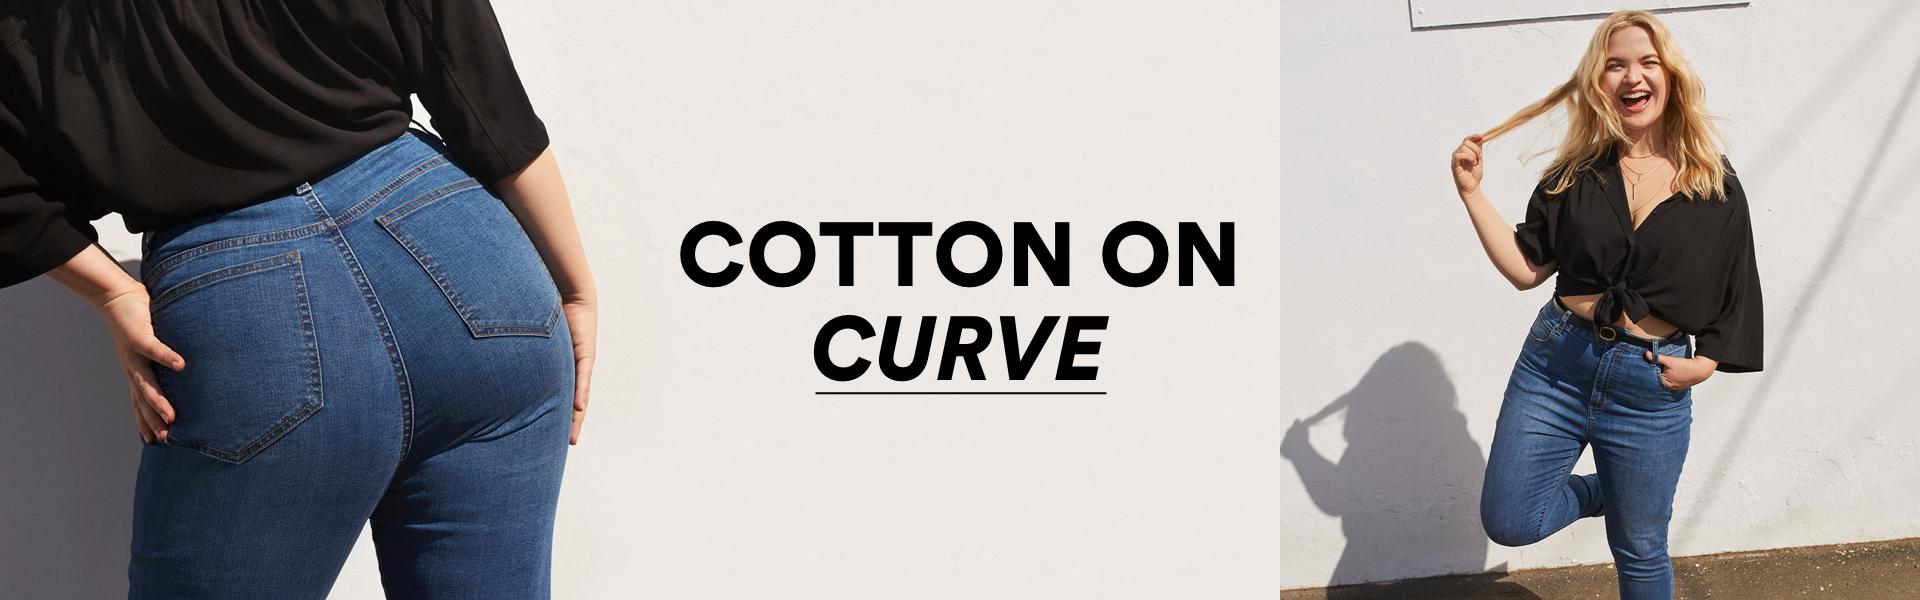 Cotton On CURVE